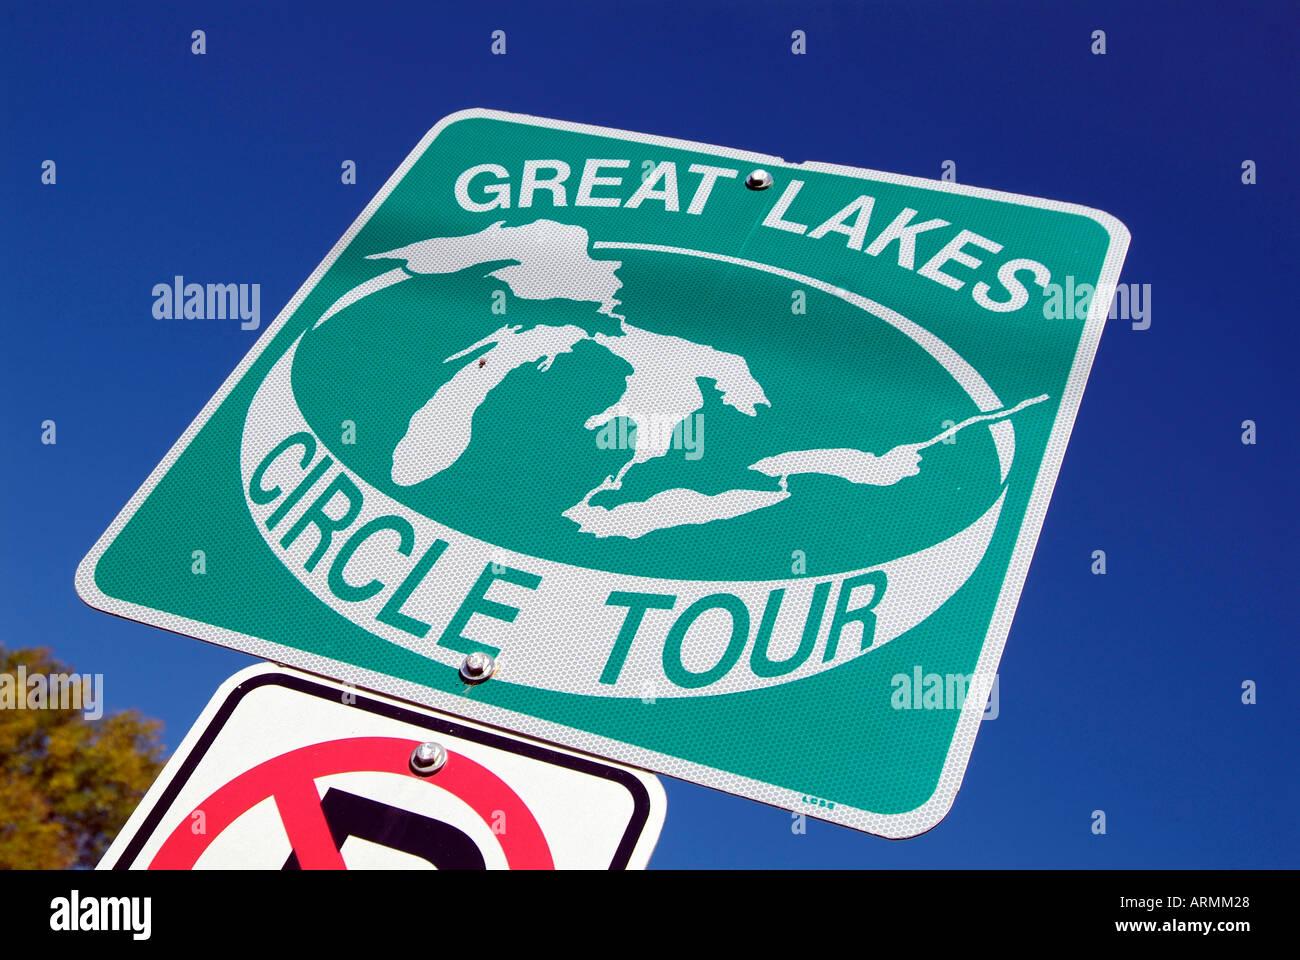 Great Lakes Circle Tour Road Sign Maps Route For Travelers Around - Lake michigan circle tour map